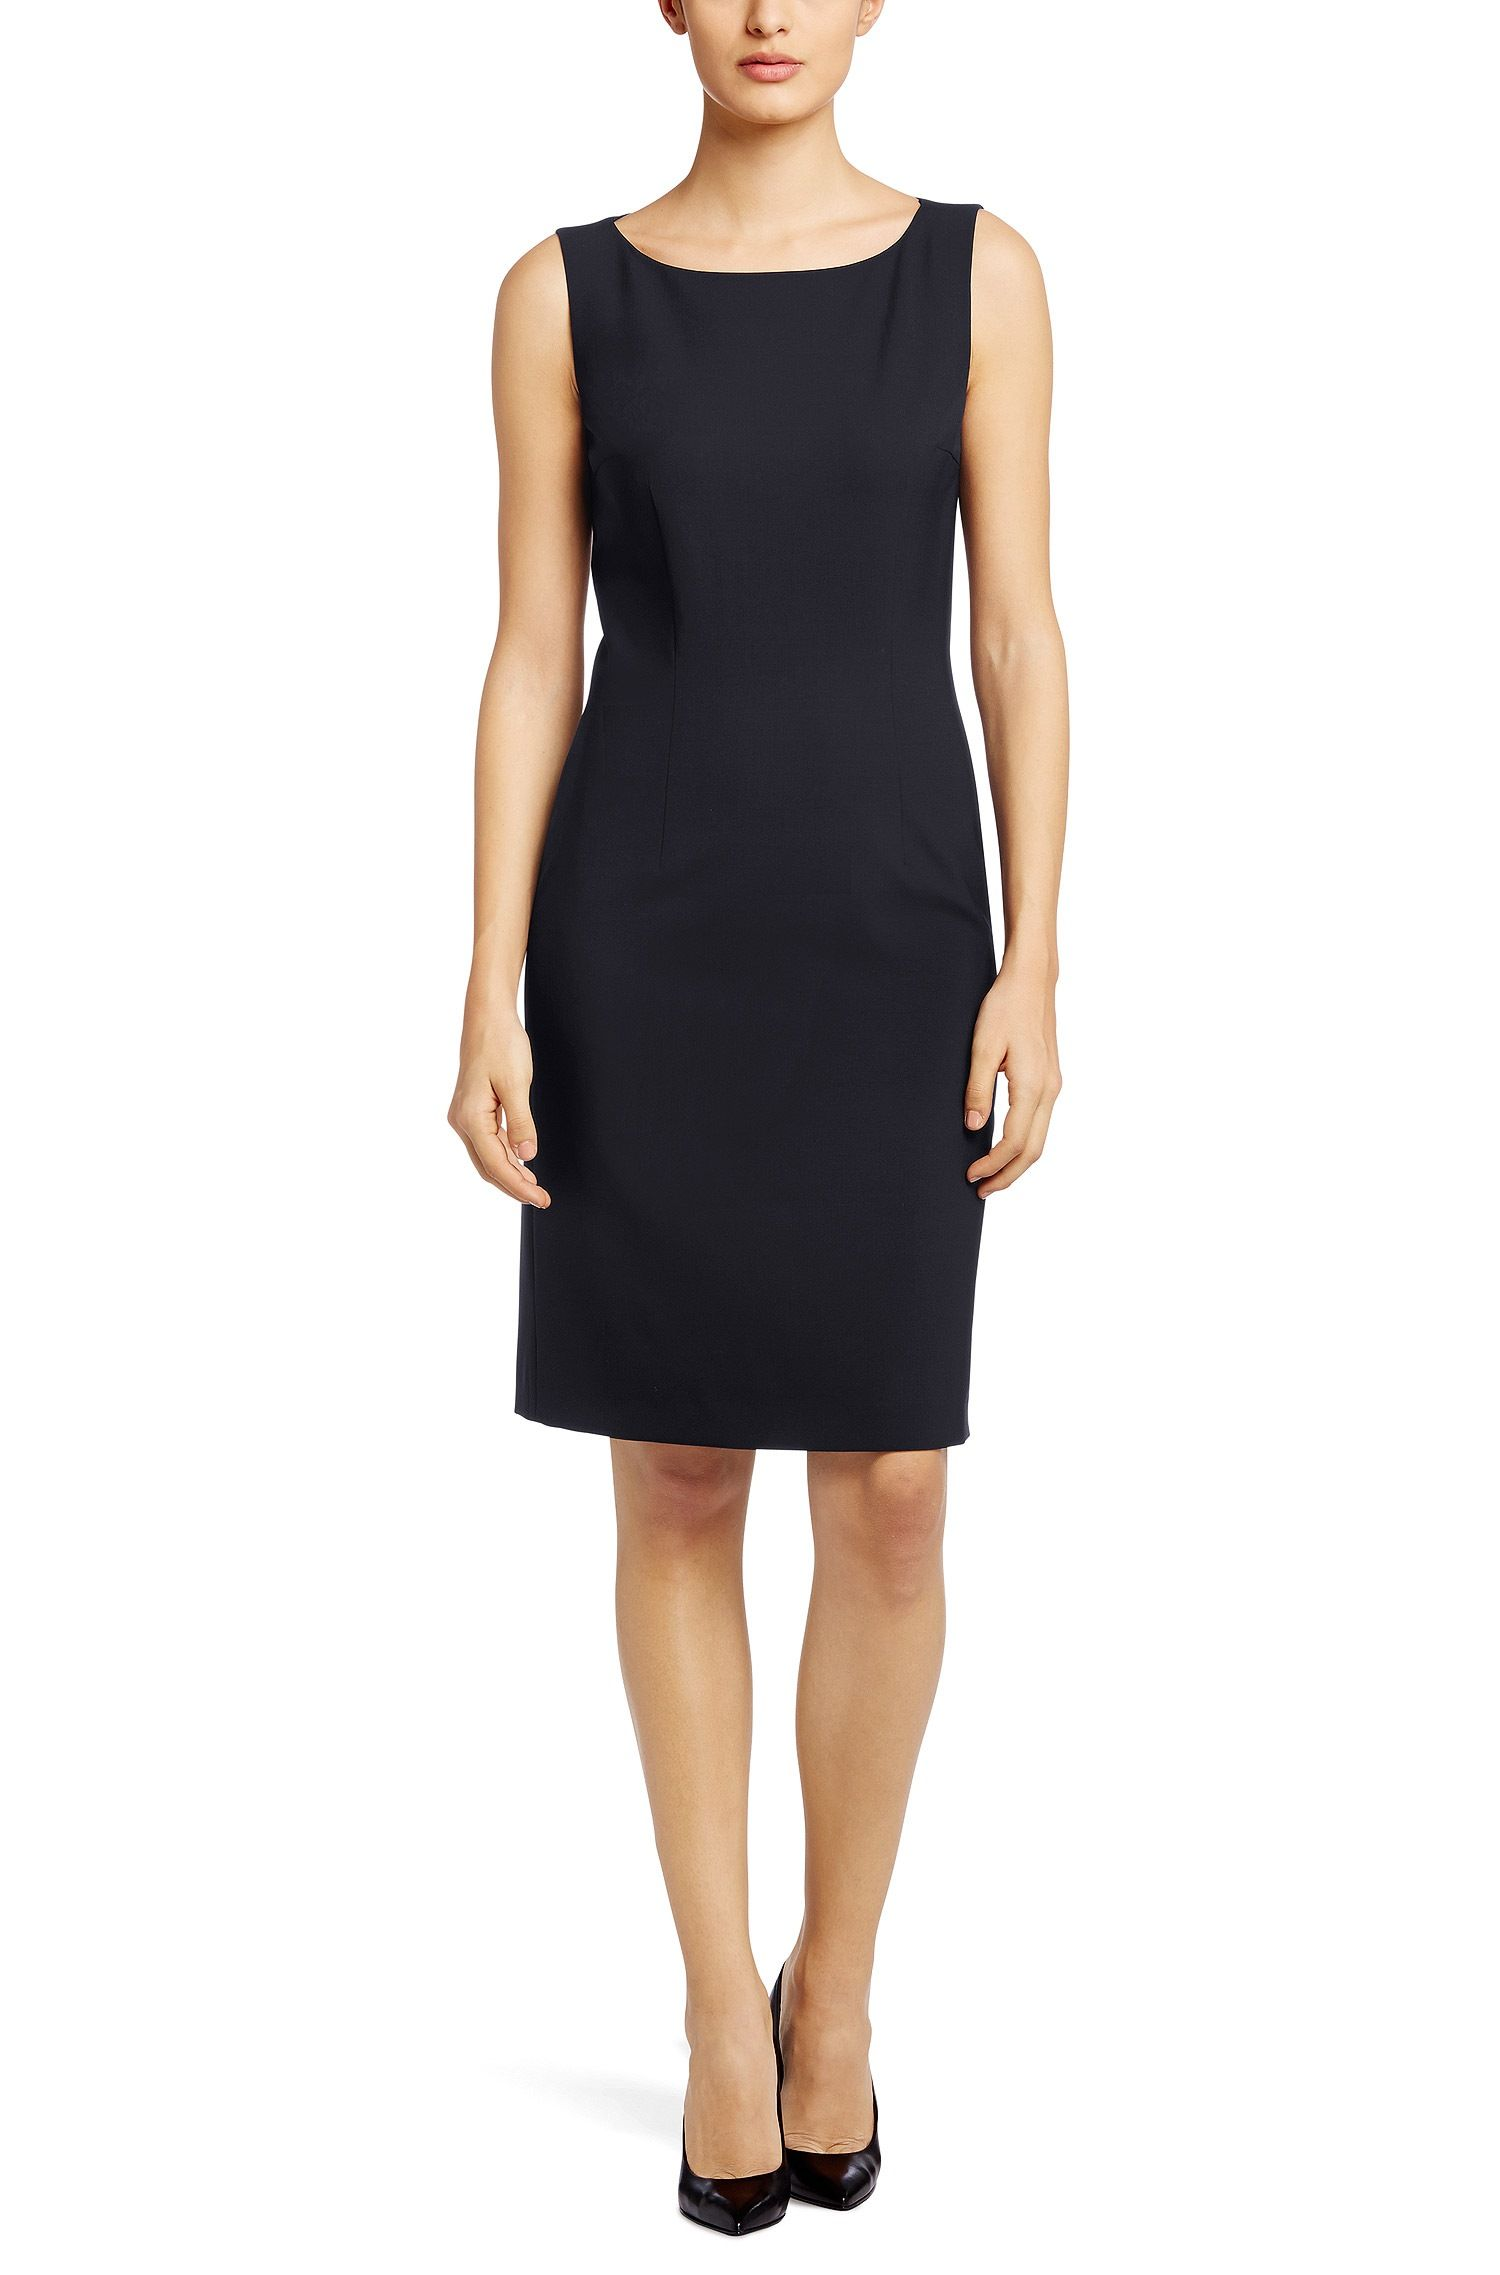 dress 'dinoma1' in a new wool blend   little black dress